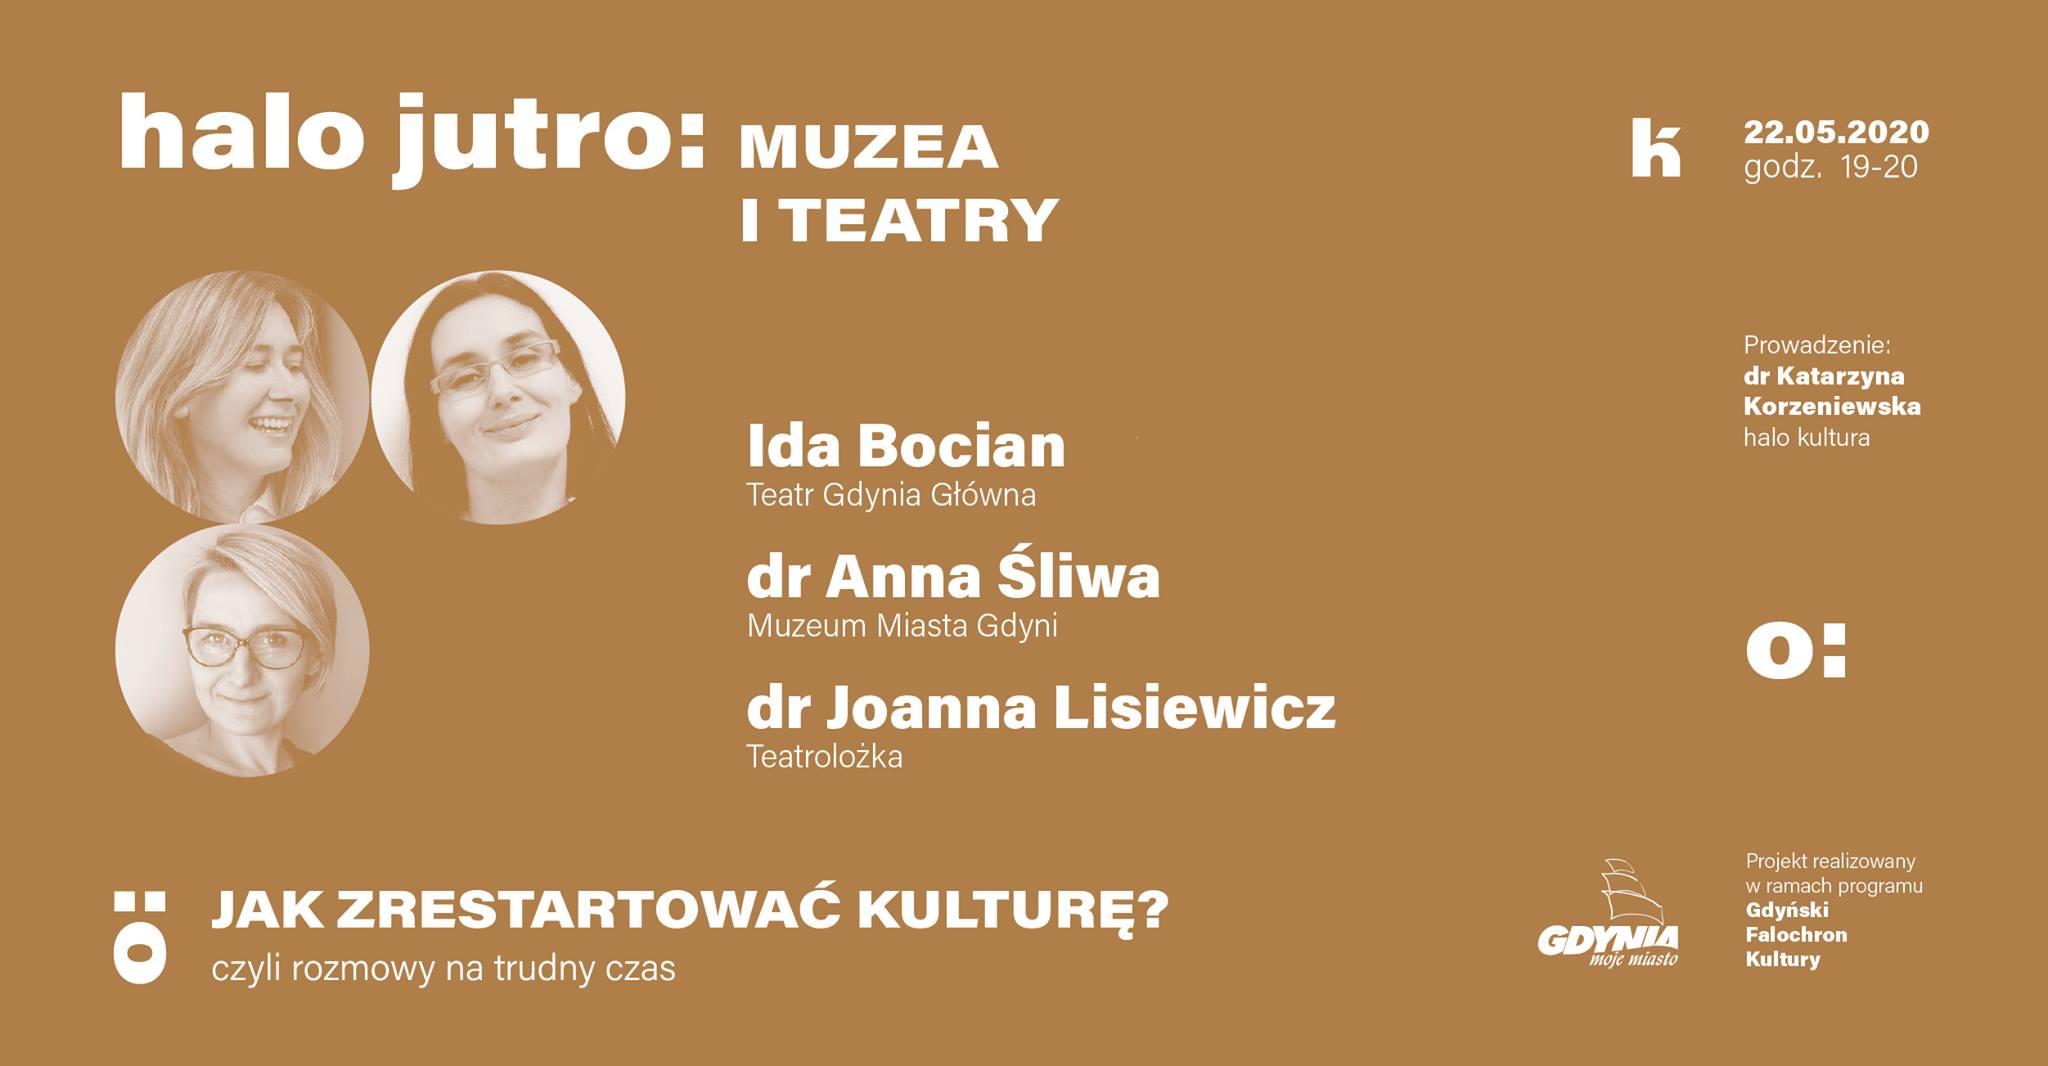 Halo Jutro: Muzea i Teatry